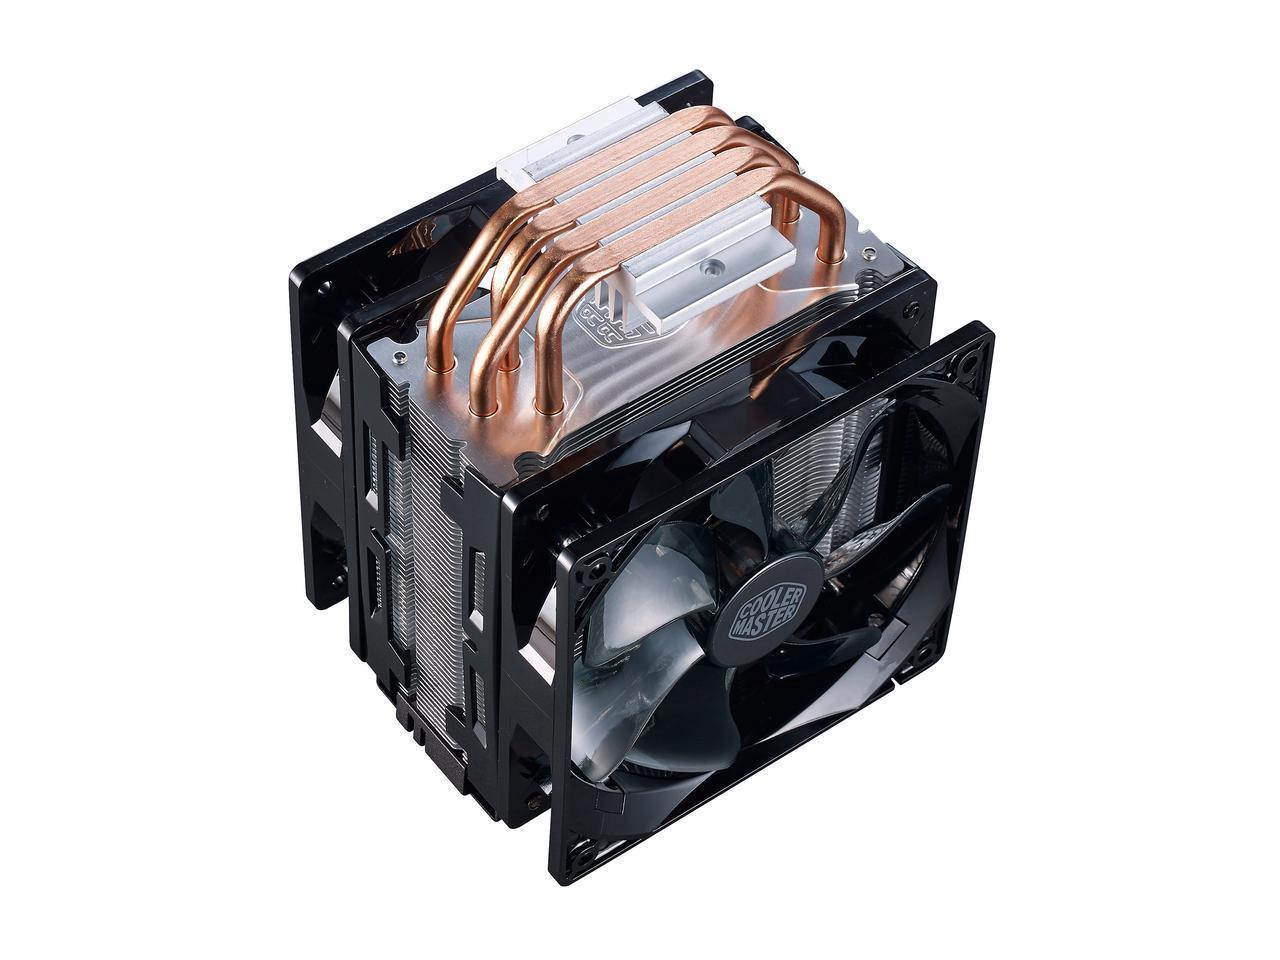 Kelebihan Cooler Master Hyper 212 Led Turbo Black Cover With Dual Fan Casing 12 Cm Alseye Sooncool Case 12cm Soon Cool Lampu 120mm Pwm Fans Red Leds